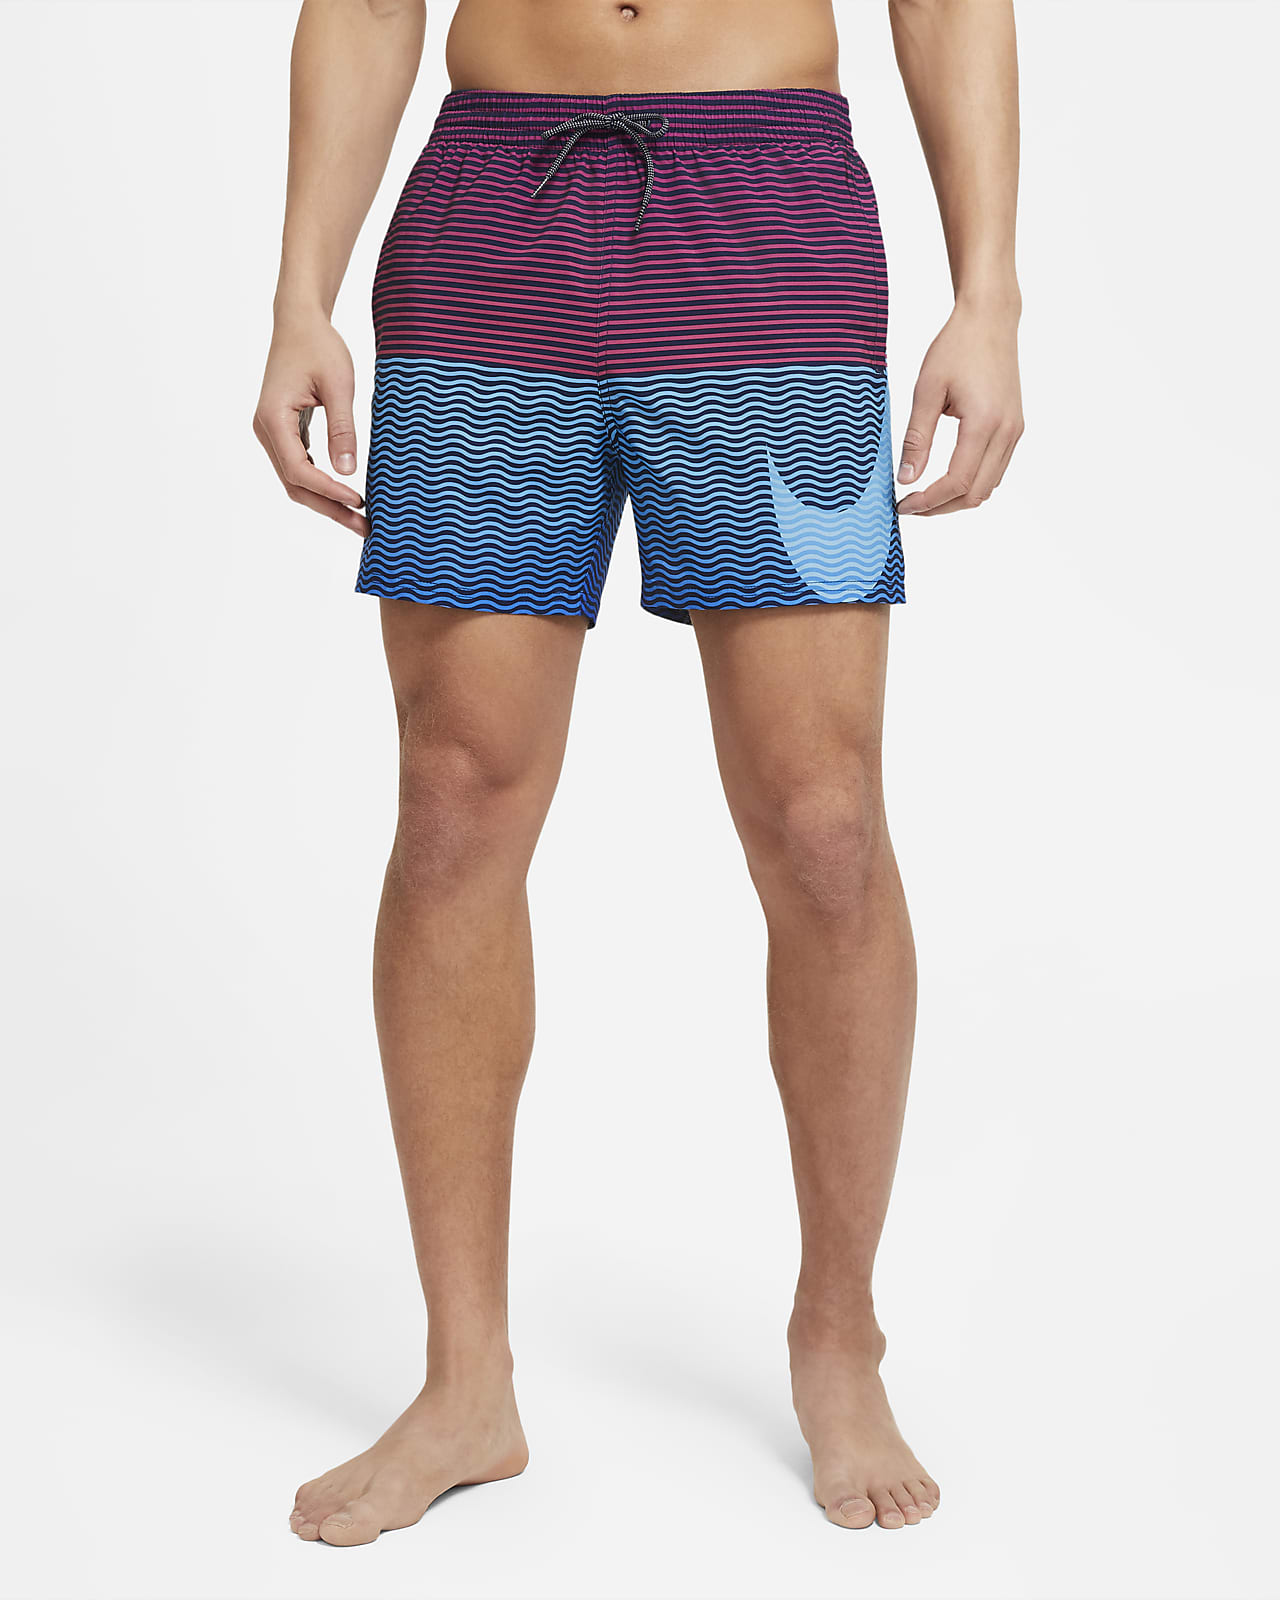 Badshorts Nike Vital 13 cm för män